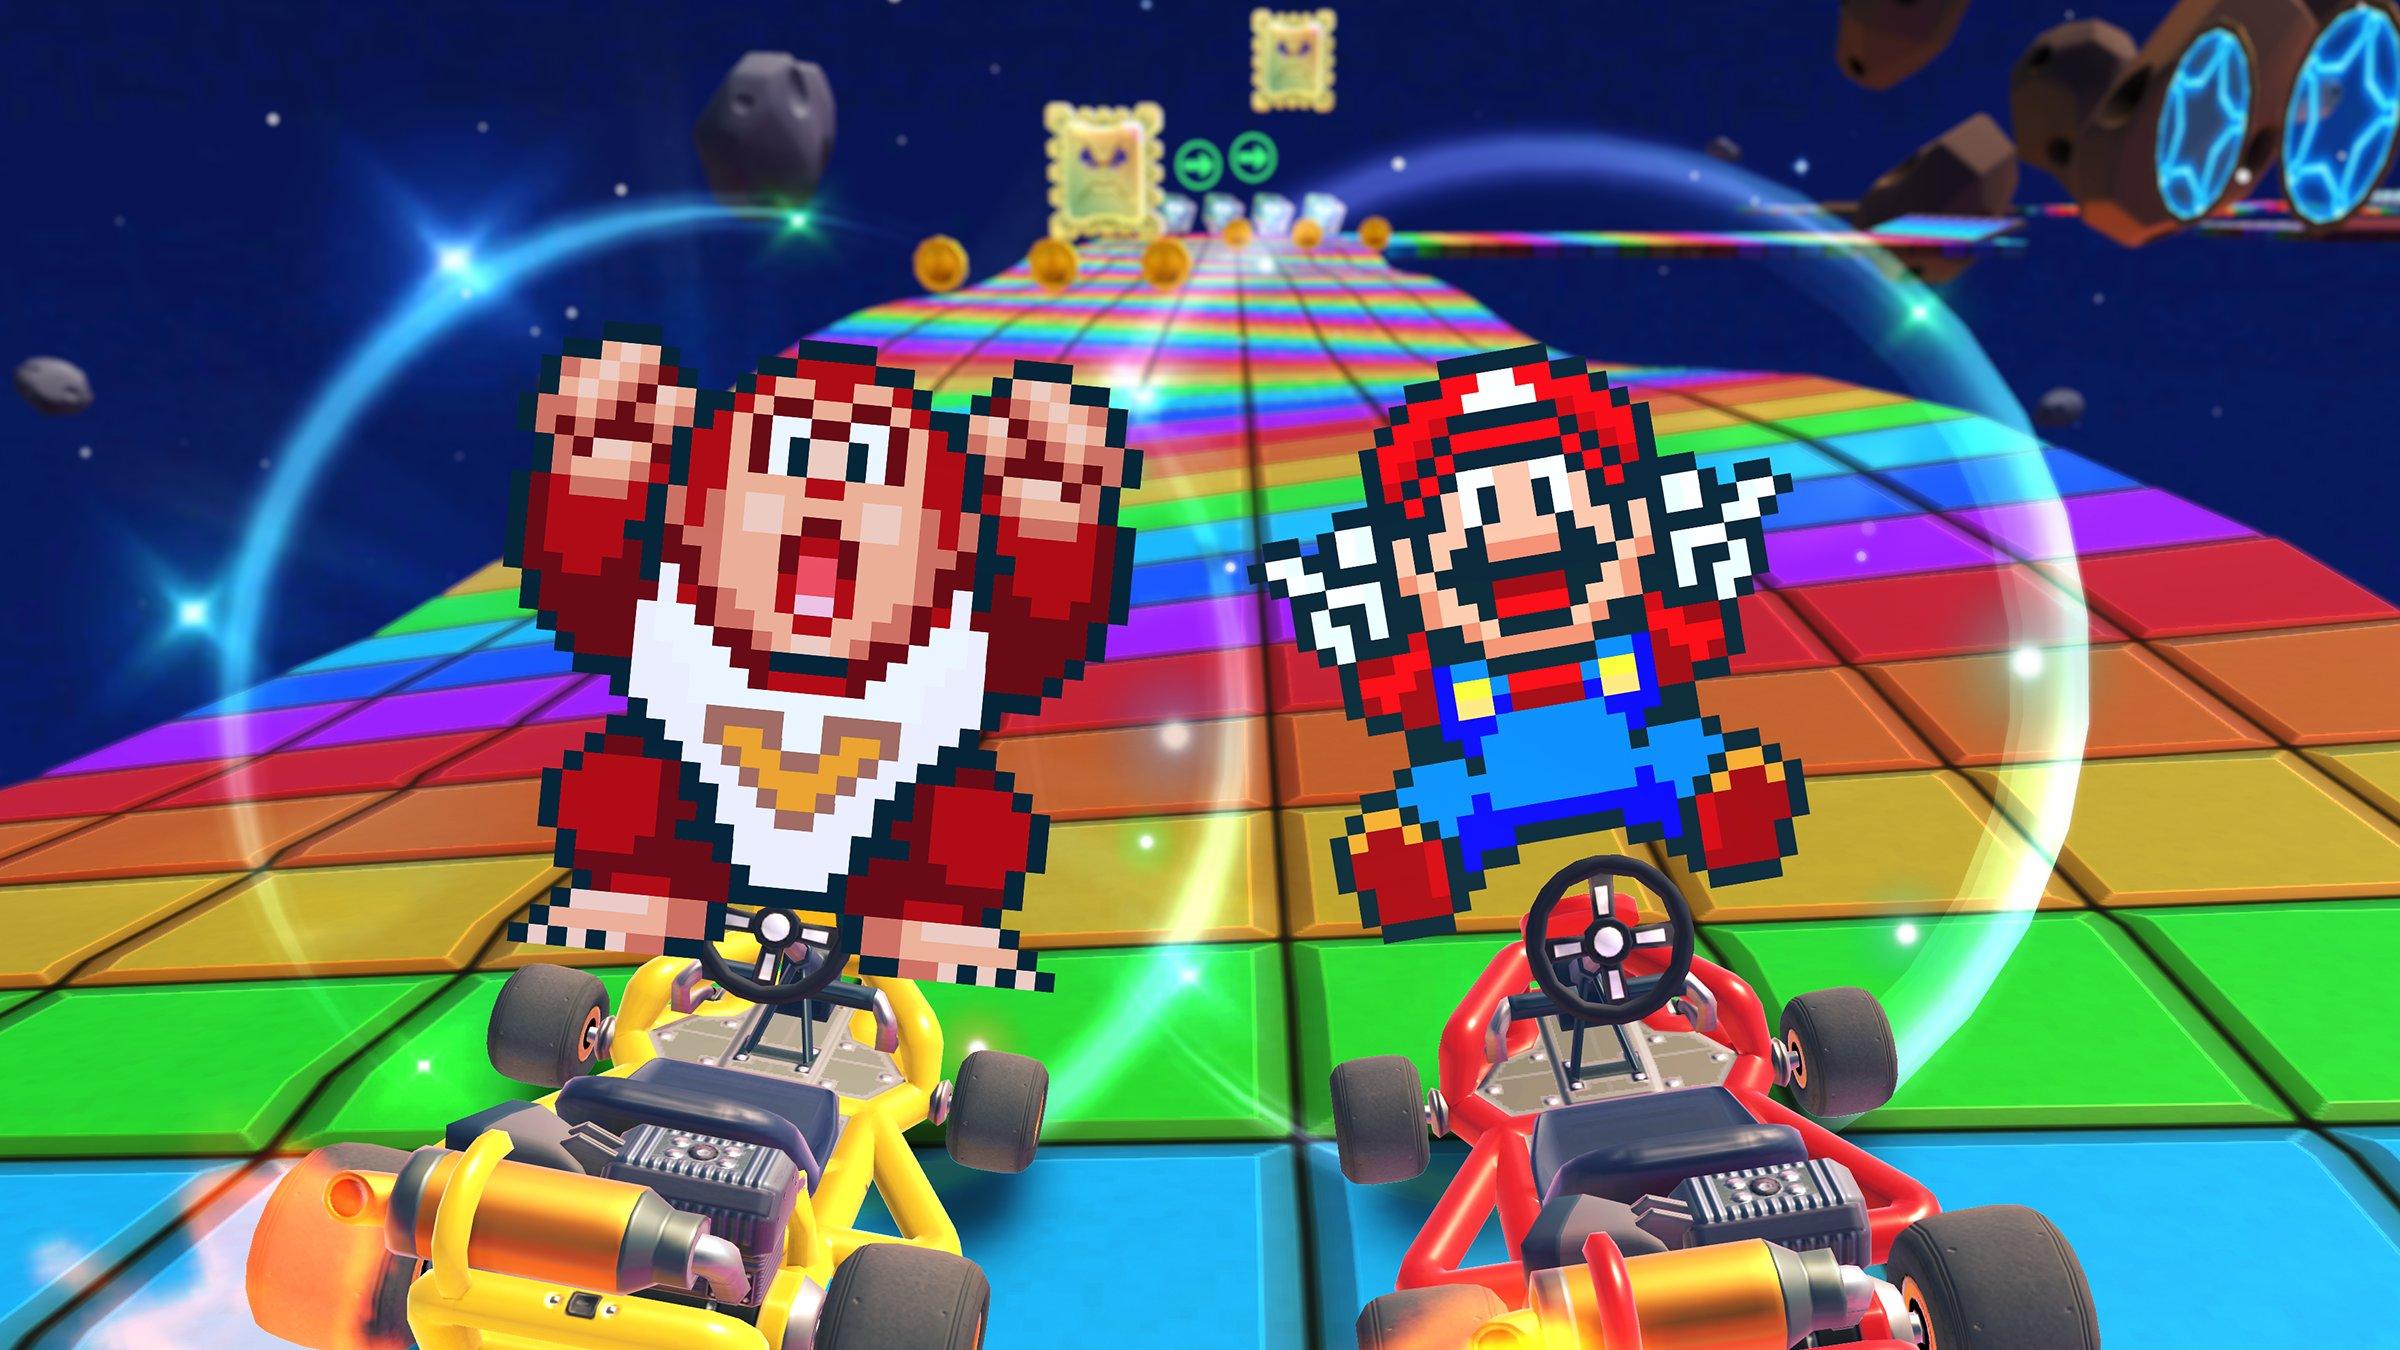 Mario Kart Tour Kicks Off The Super Mario Kart Tour On Sept 8th Mario Snes And Donkey Kong Jr Snes Included Gonintendo